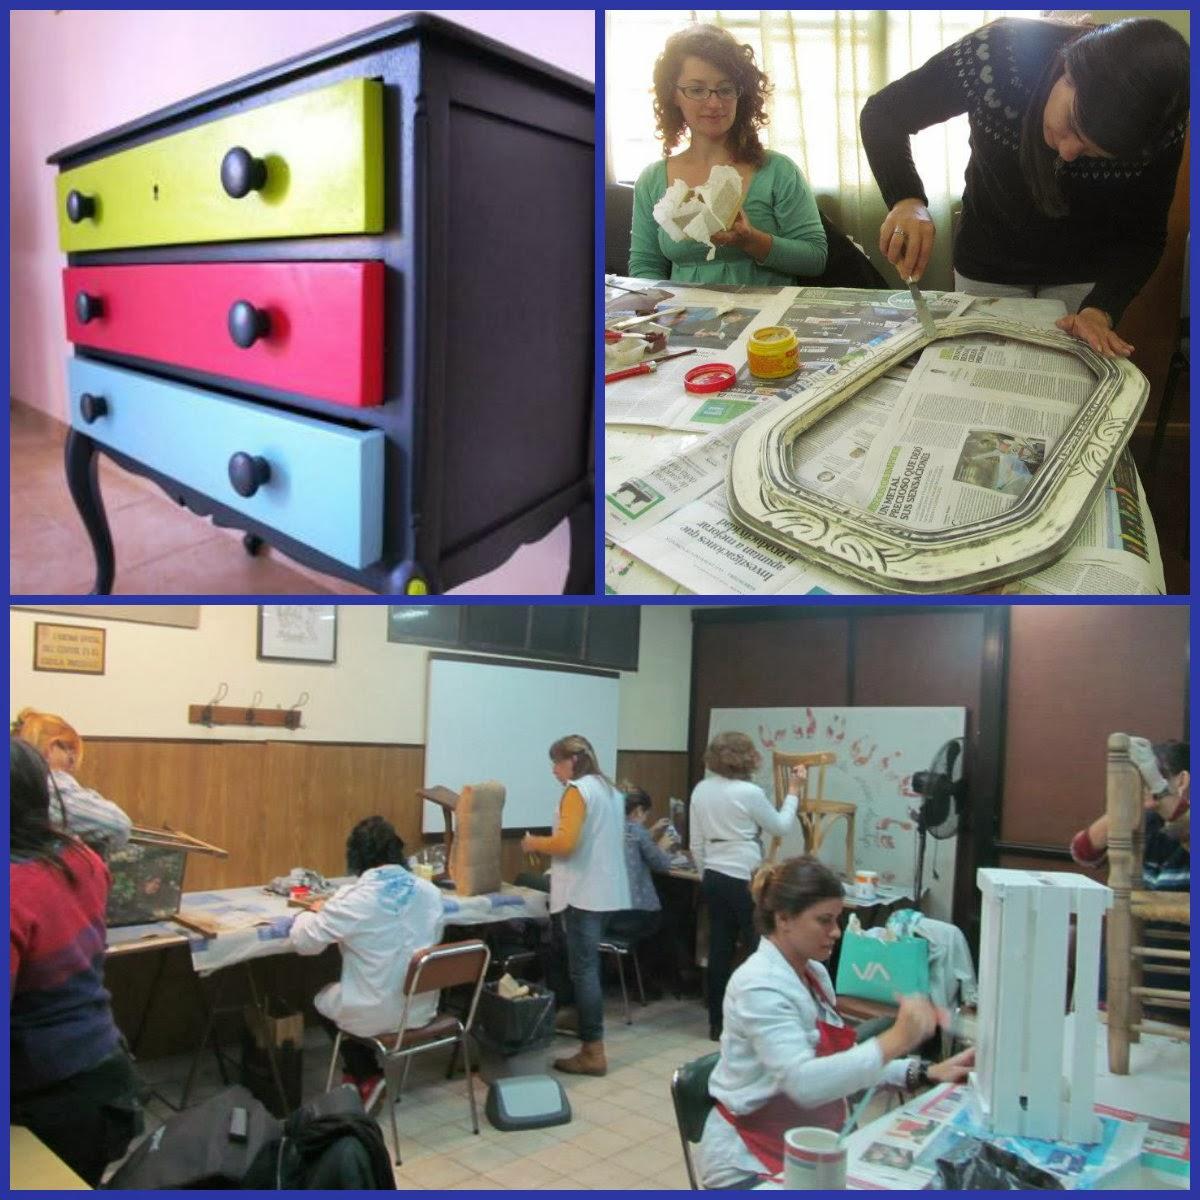 Academia sapiens taller de restauraci n de muebles y for Taller de restauracion de muebles